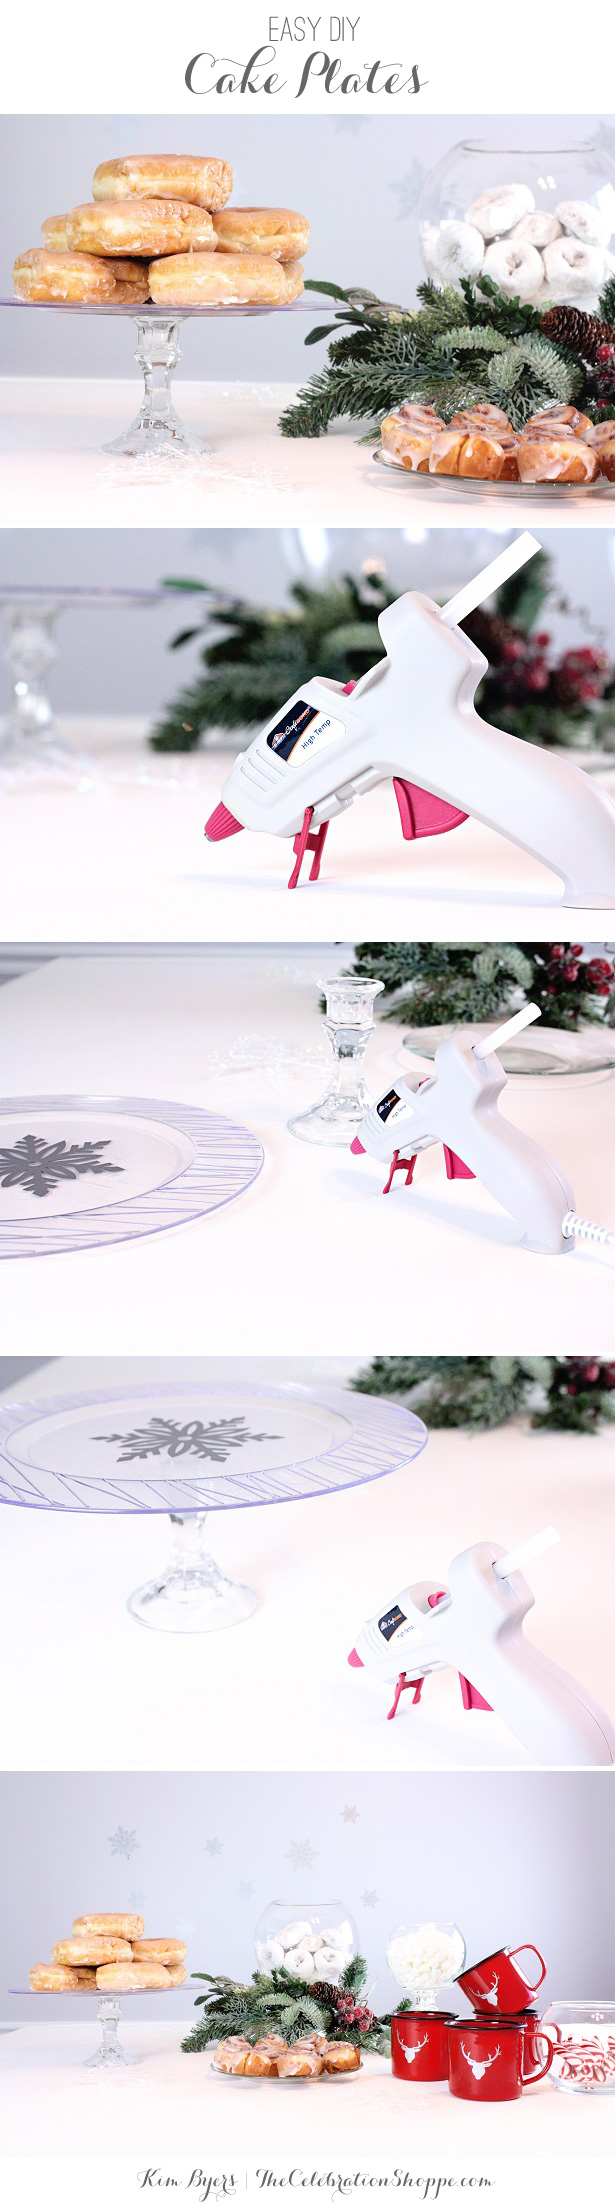 Make Easy DIY Cake Plates | @kimbyers TheCelebrationShoppe.com